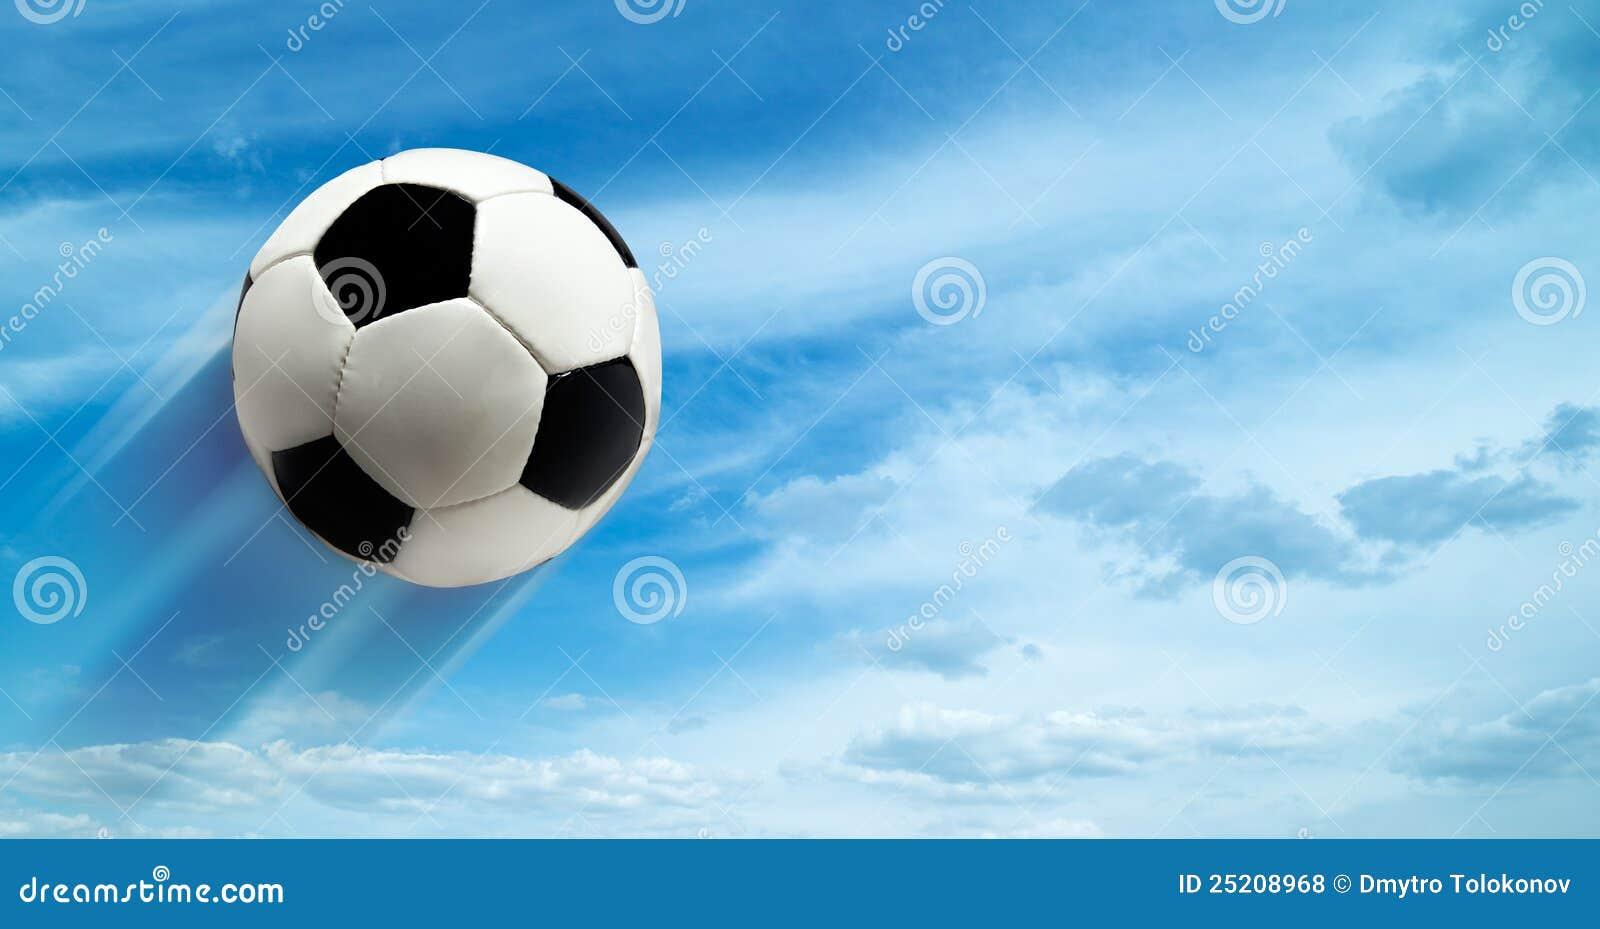 Fondos abstractos del f tbol de ar del balompi fotos de for Fondos de futbol